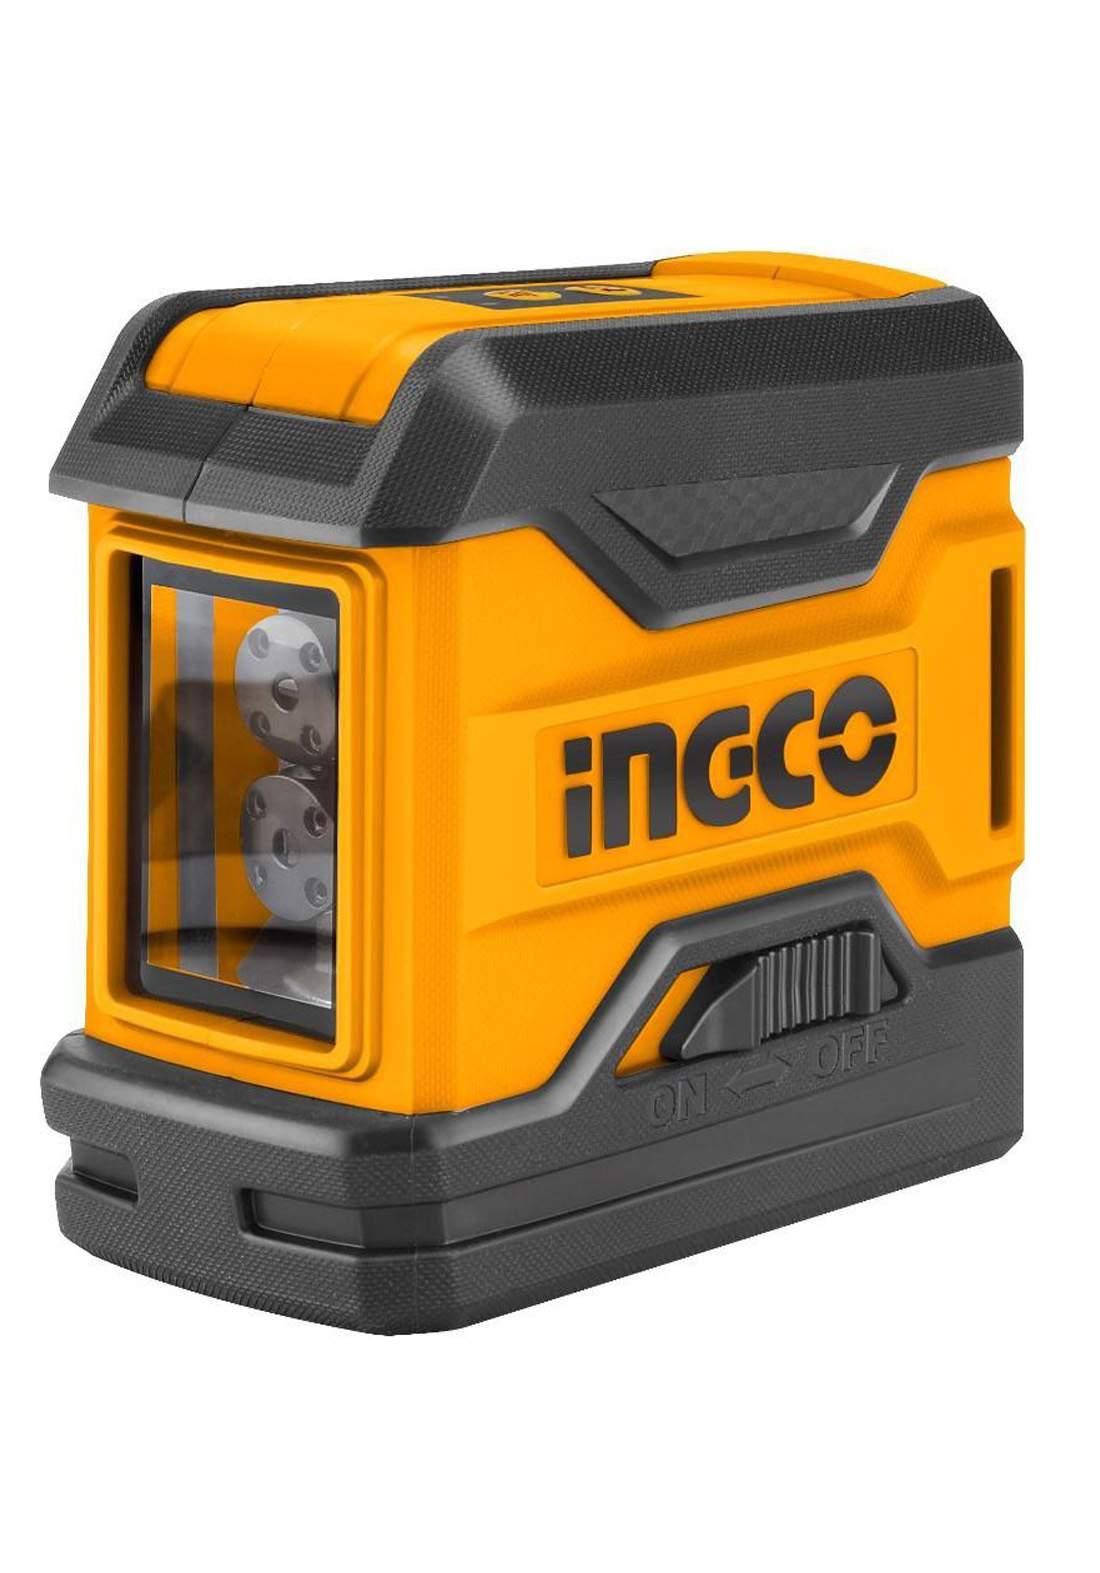 Ingco - hll156508   Self Leveling Line Laser  مقياس مستوي خطي ليزري